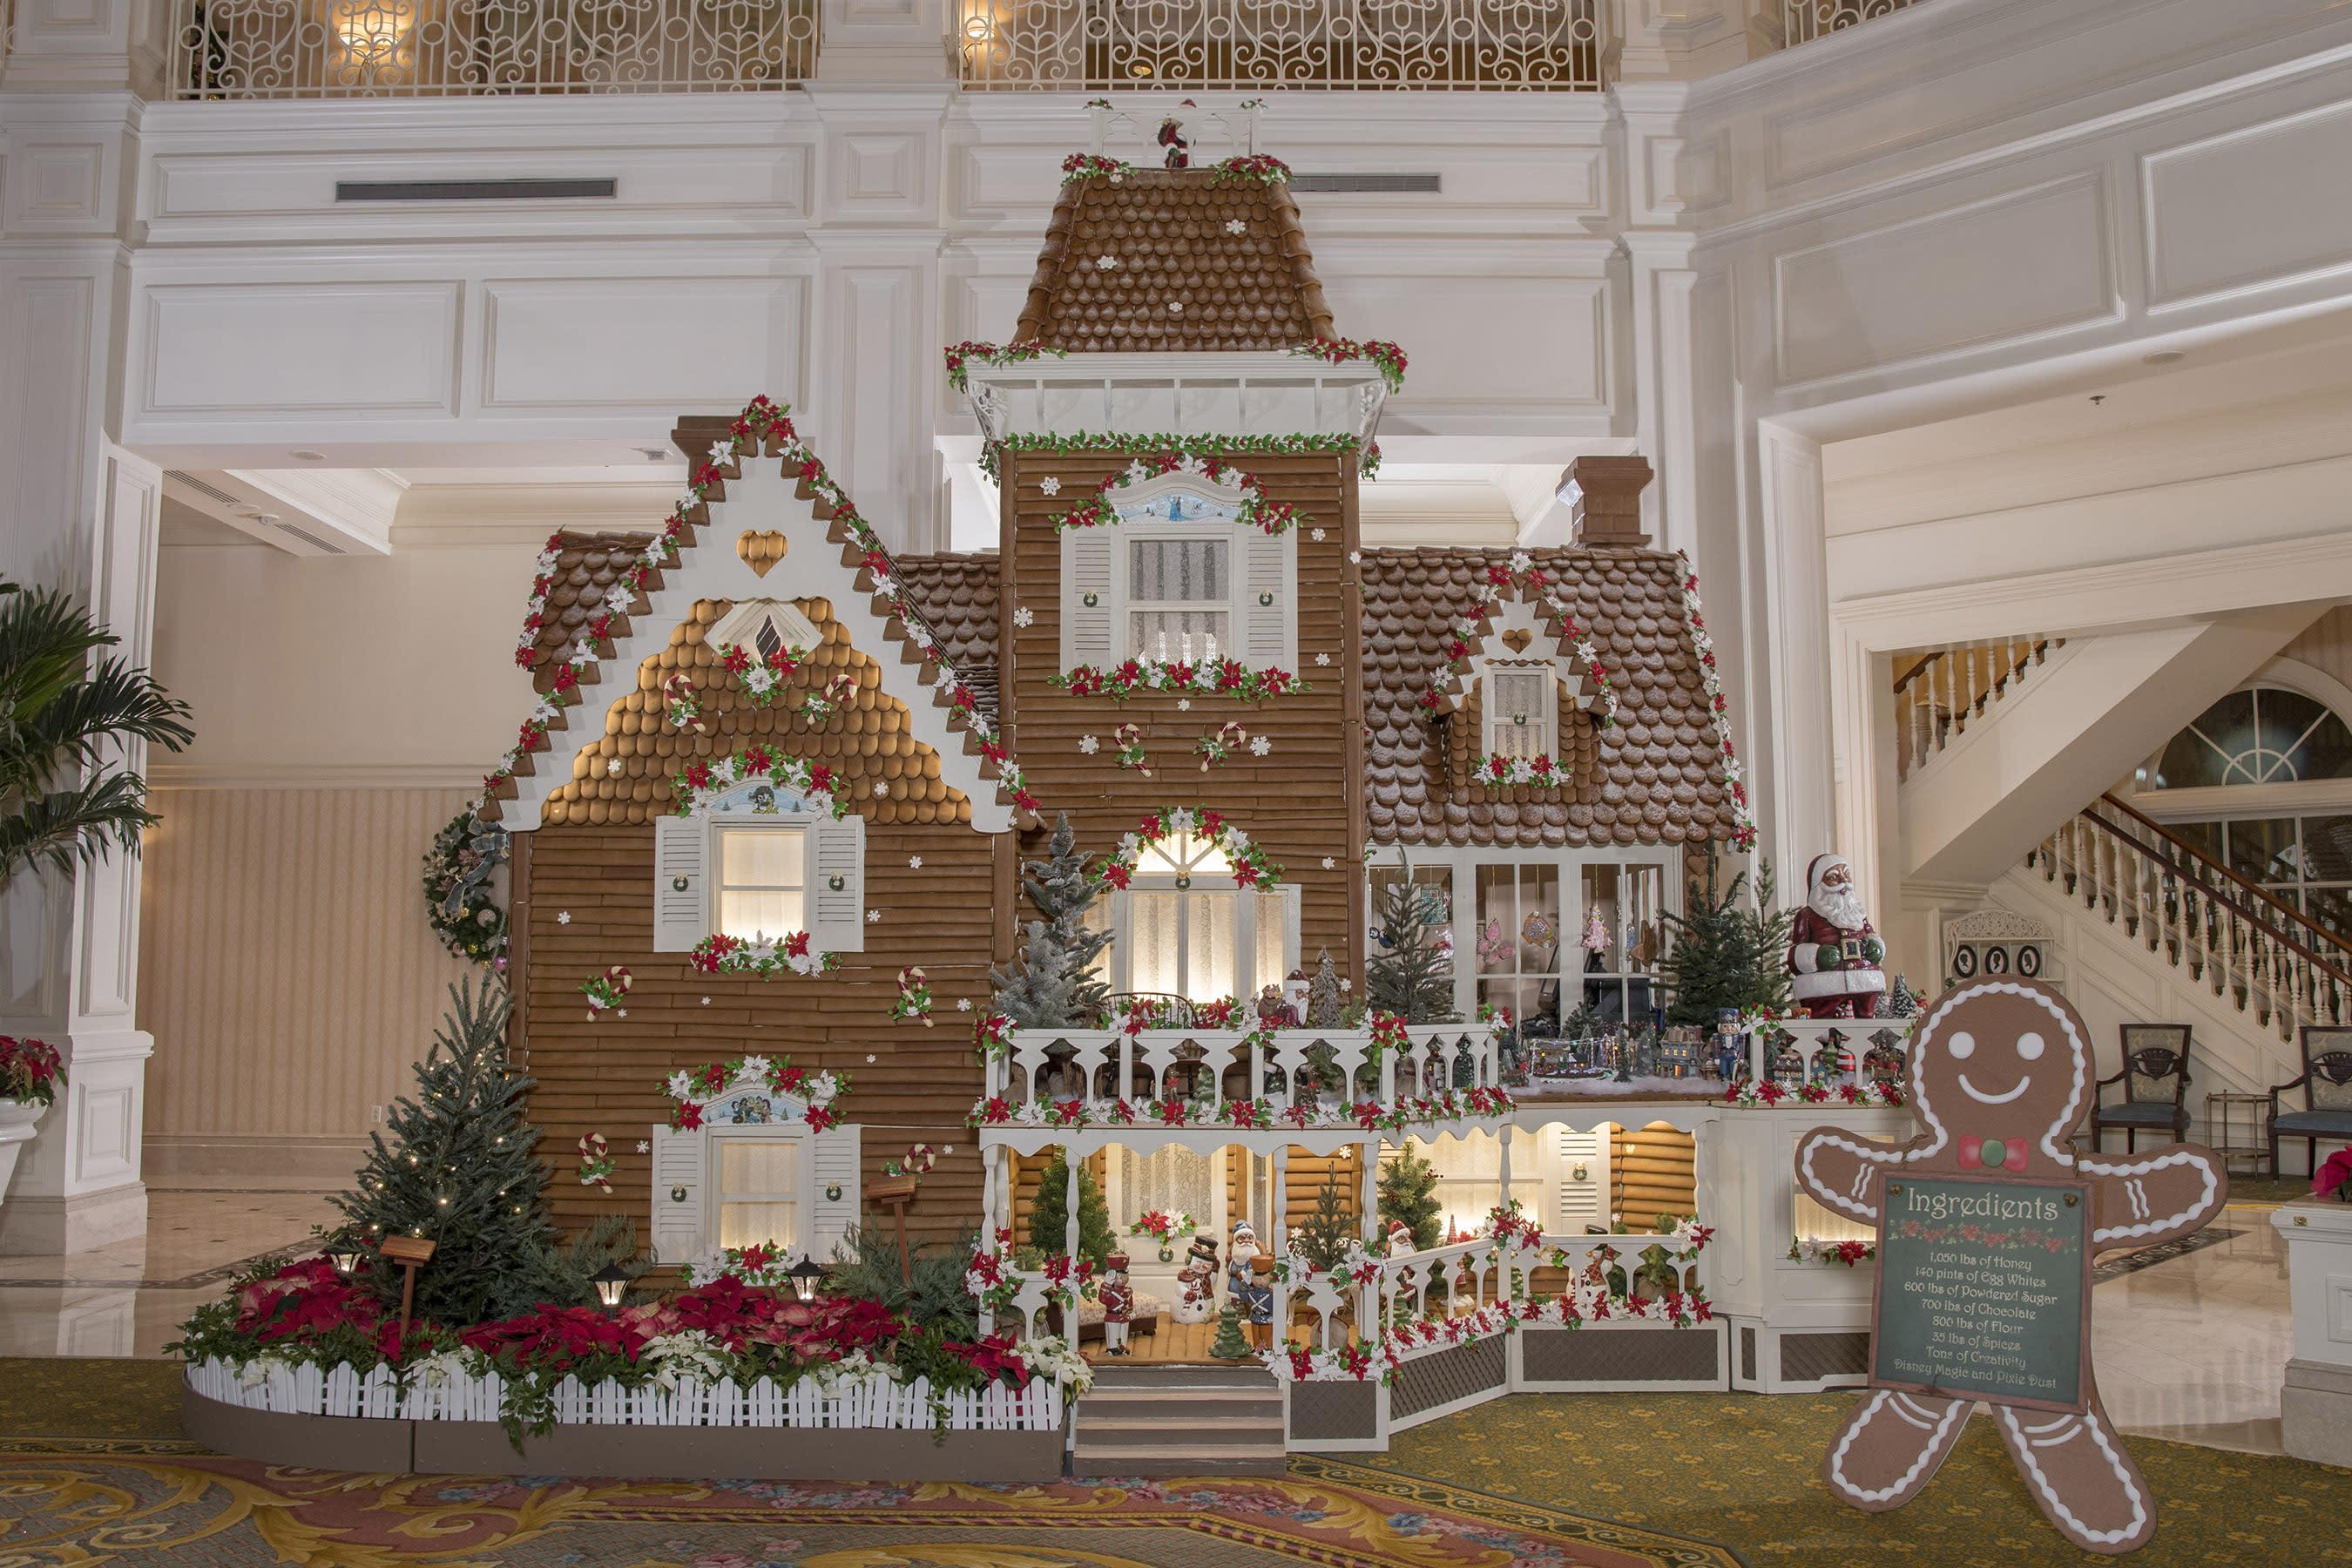 Gingerbread House at Disney's Grand Floridian Resort & Spa at Walt Disney World Resort in Orlando